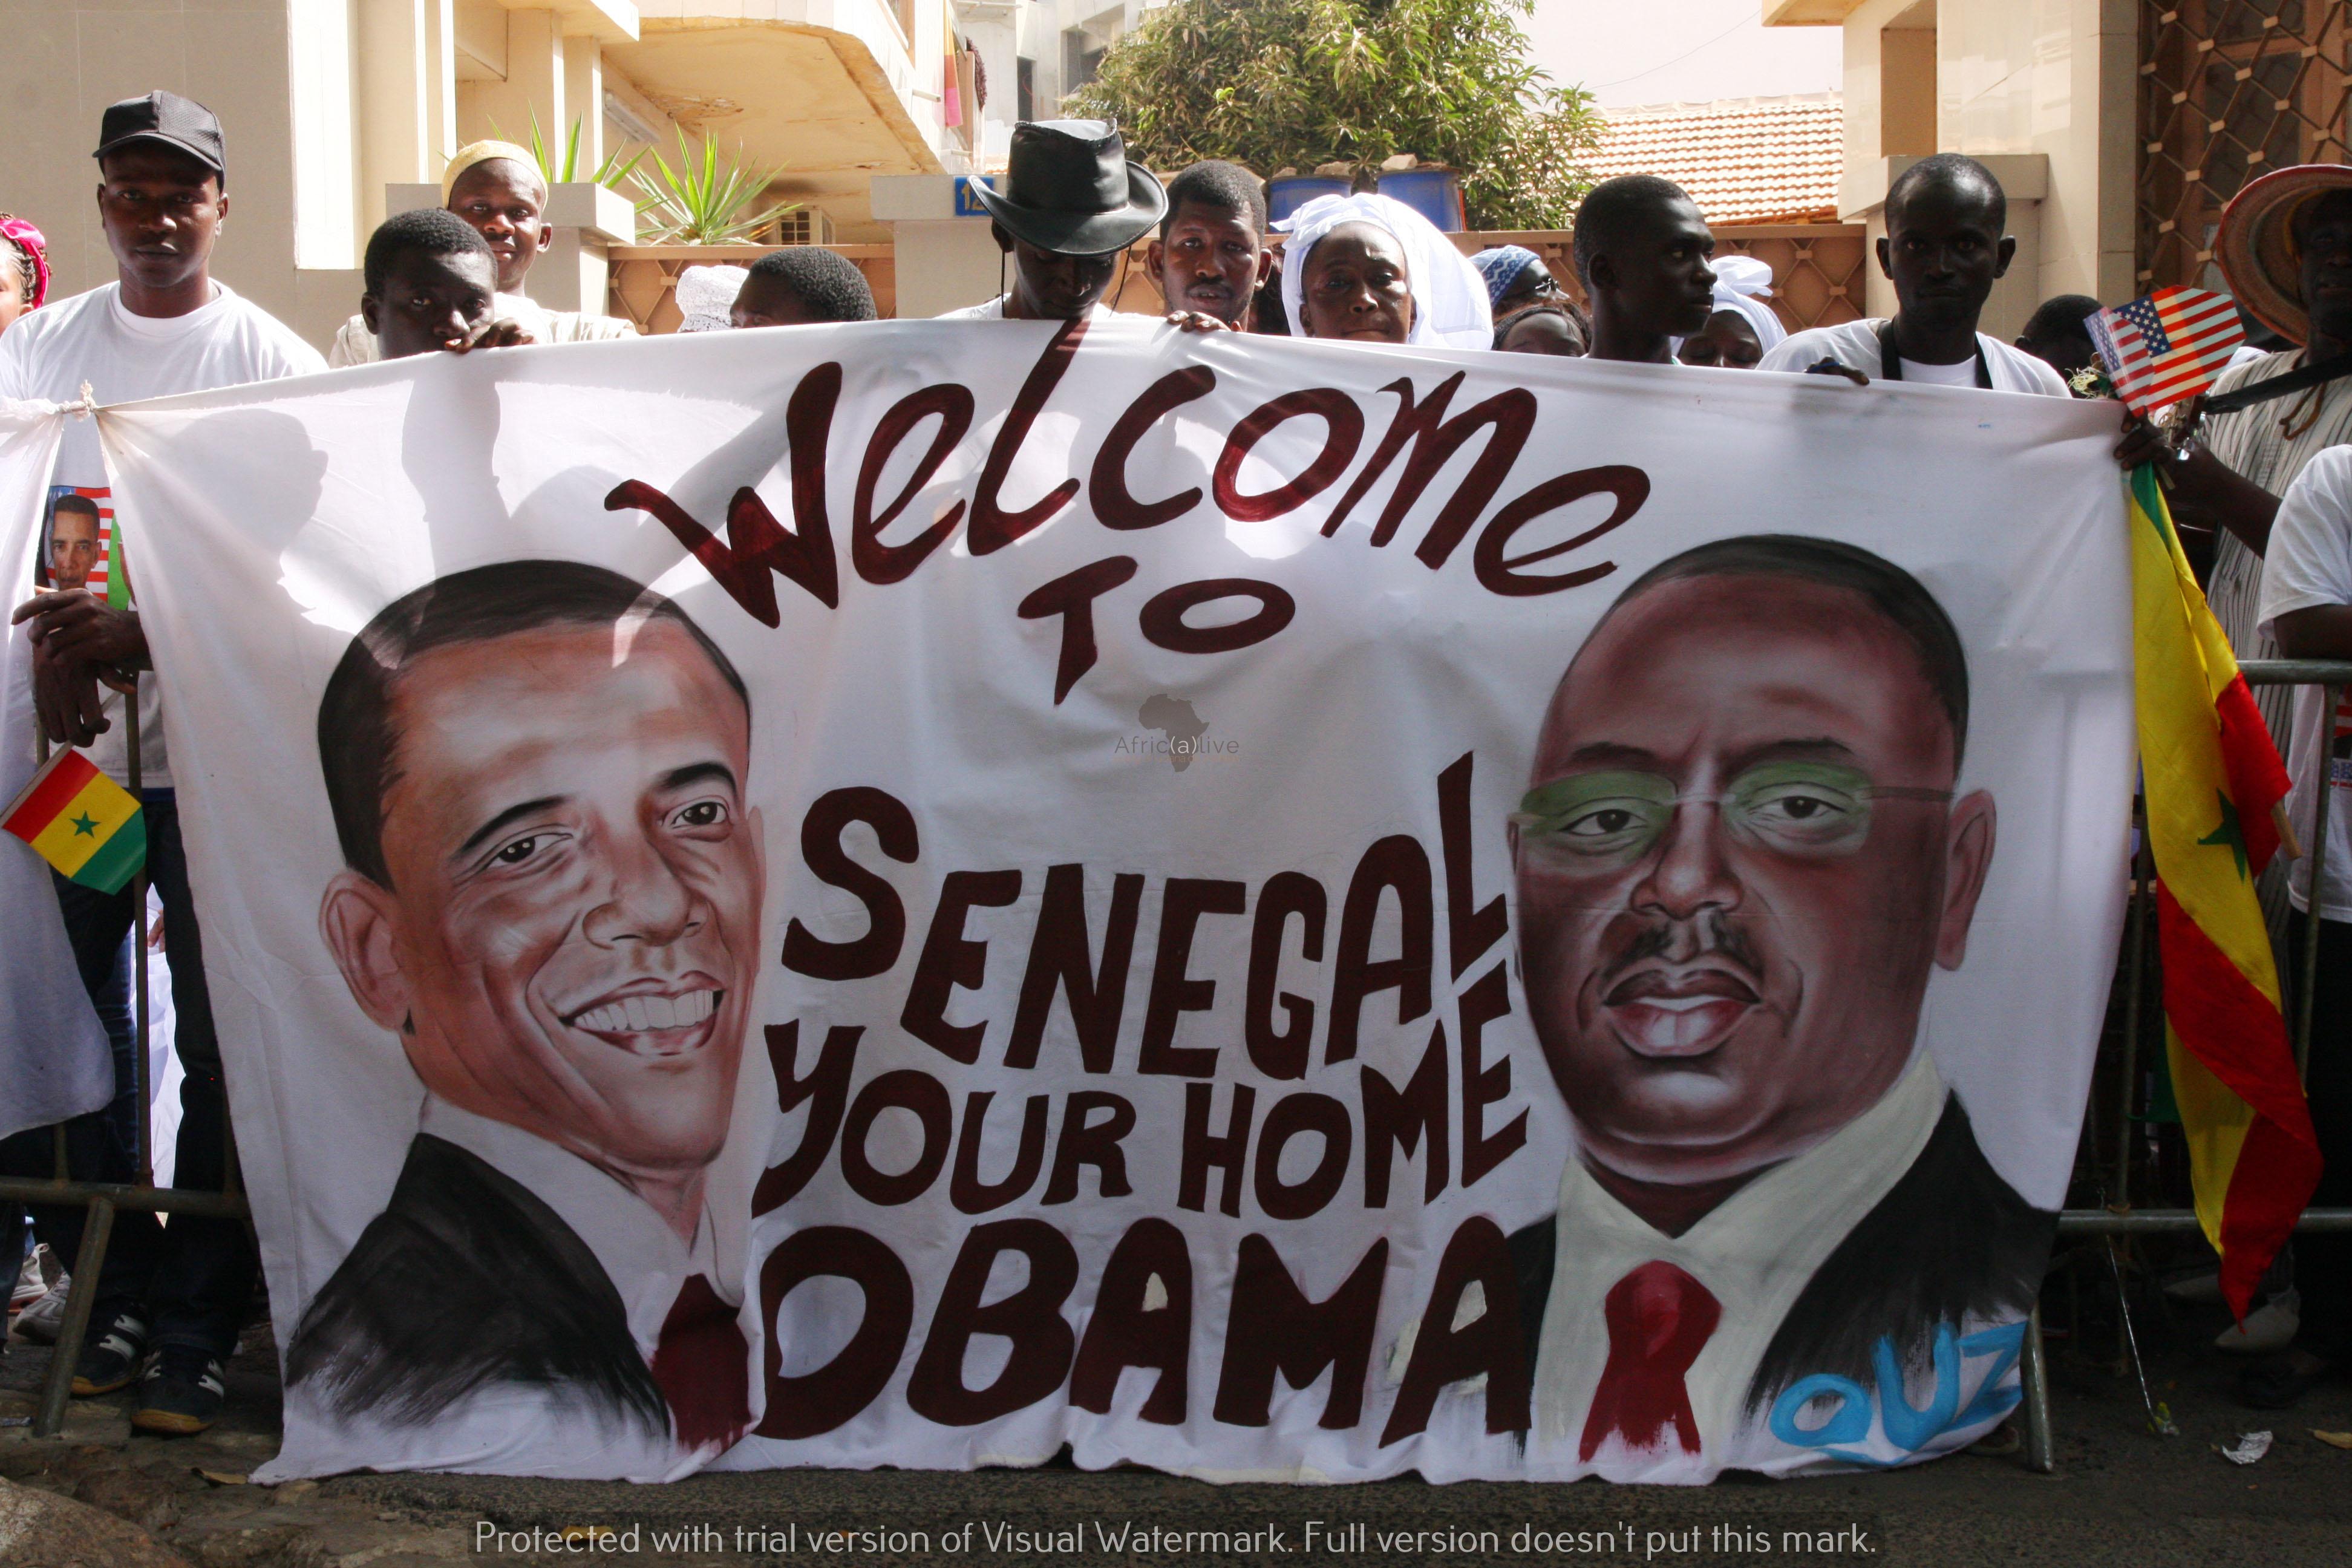 La visita di Barack Obama in Senegal